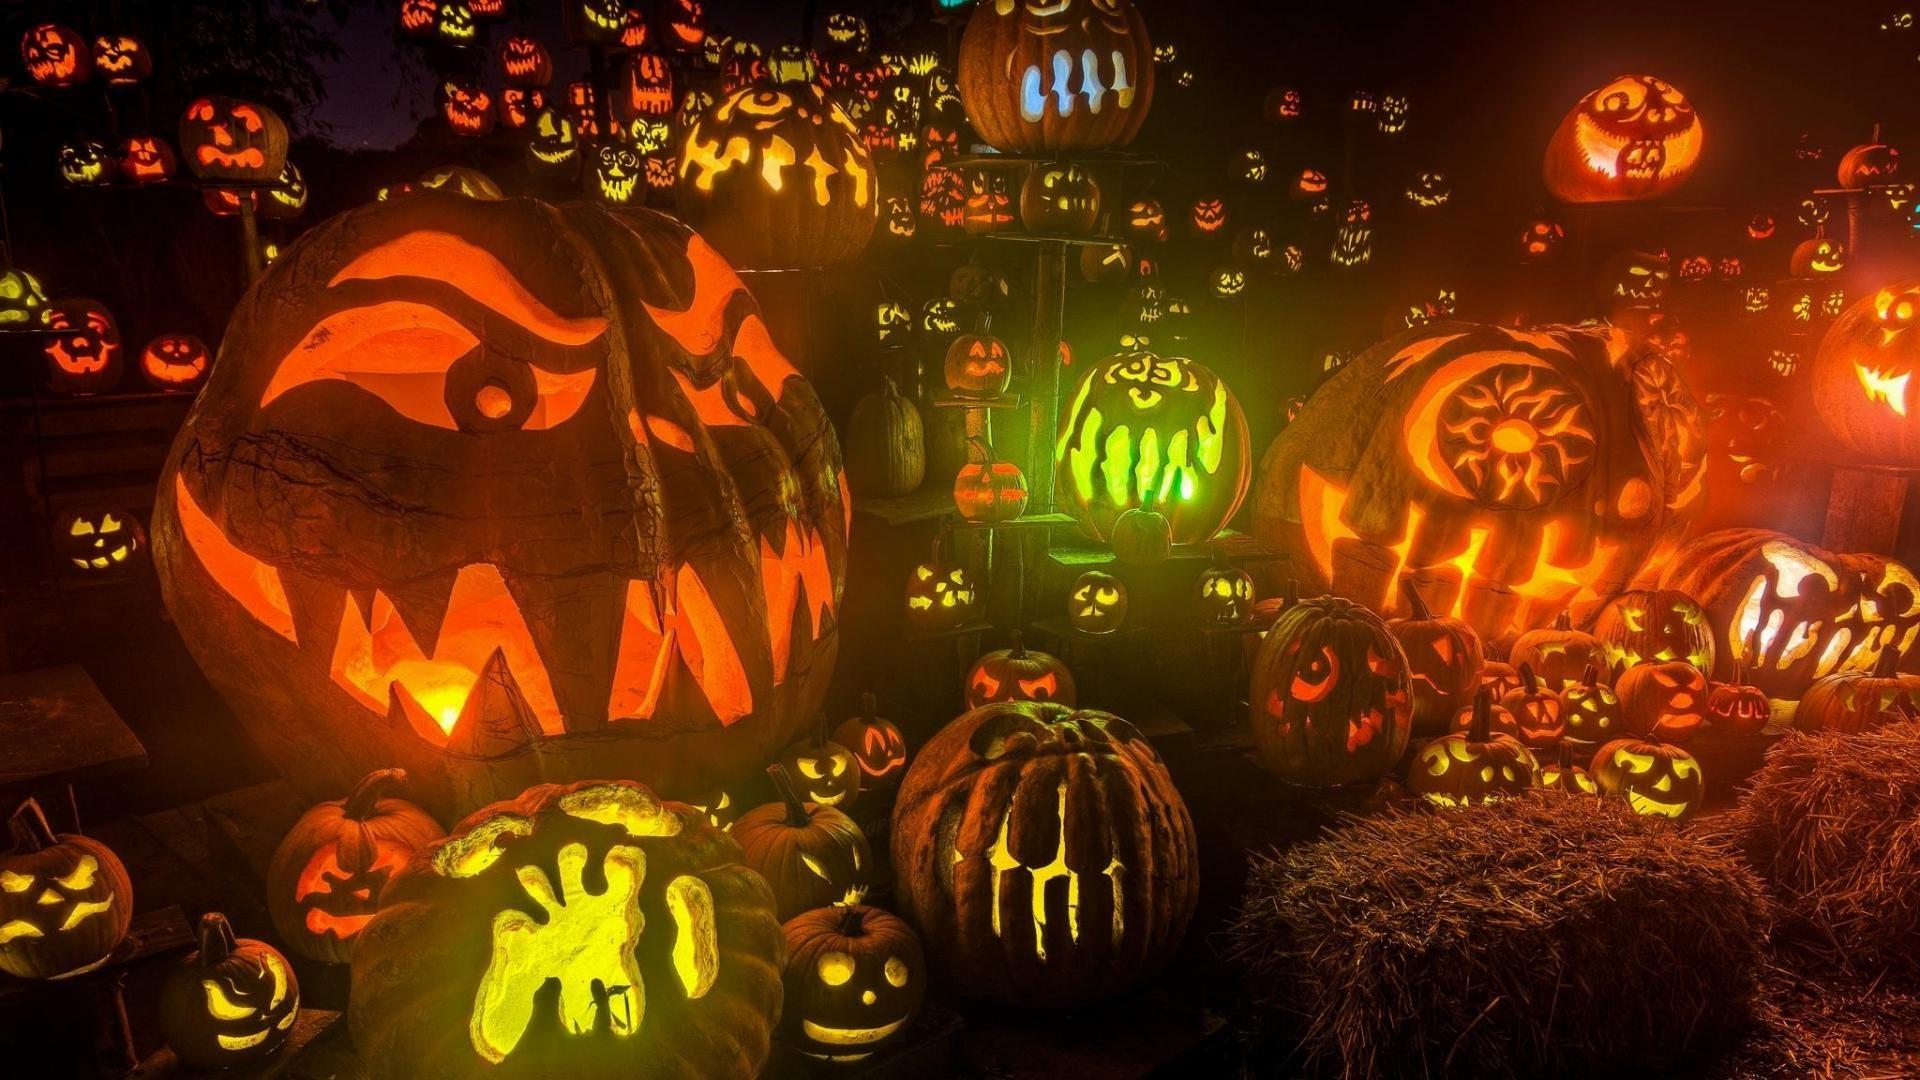 Hd Halloween Desktop Backgrounds ① Wallpapertag